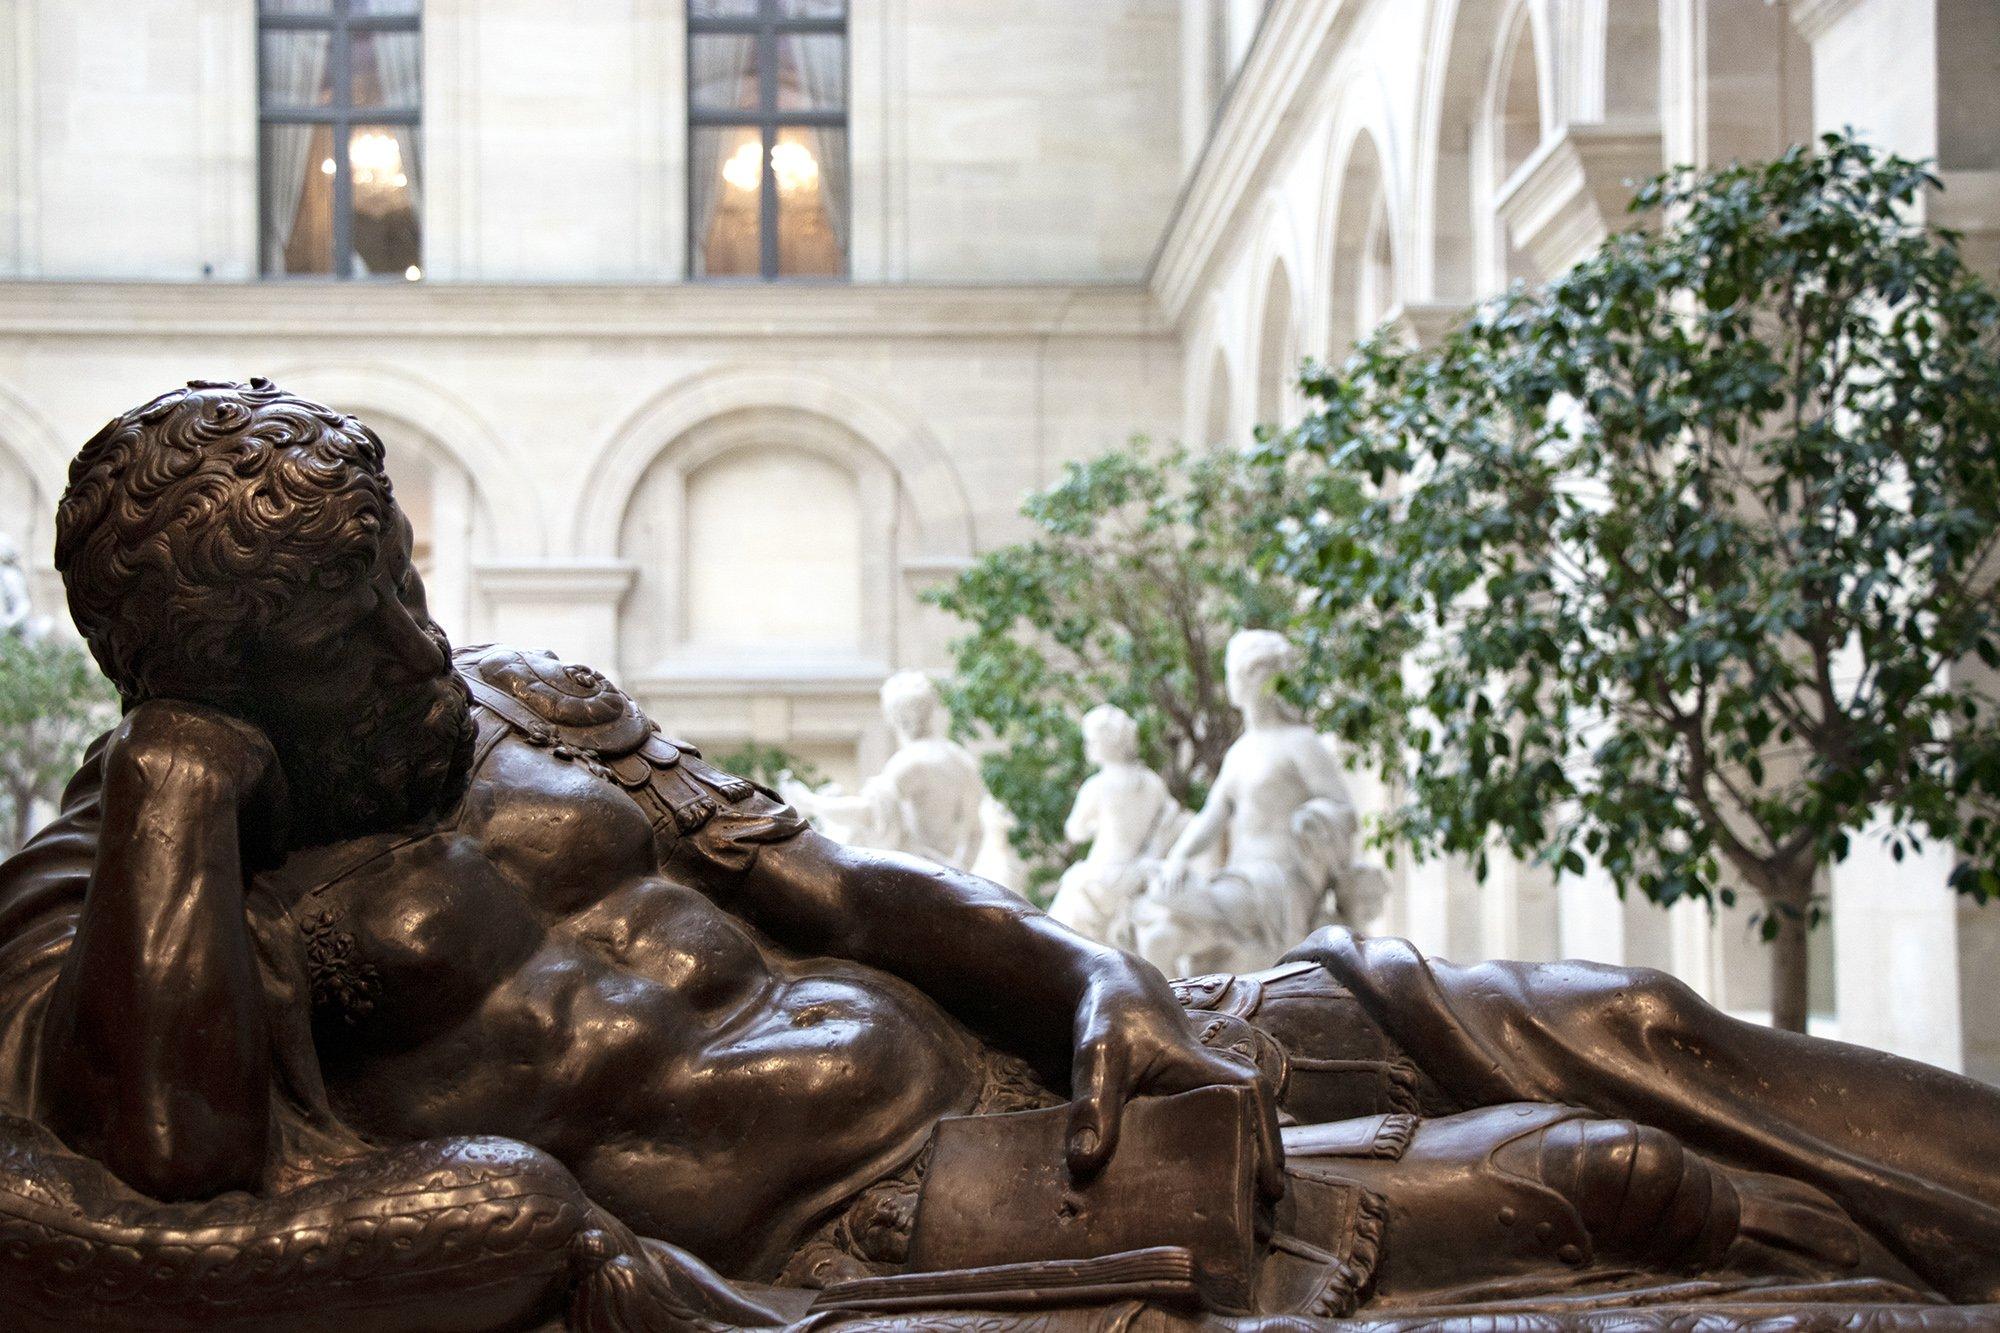 Statue of man reading book in Louvre, Paris